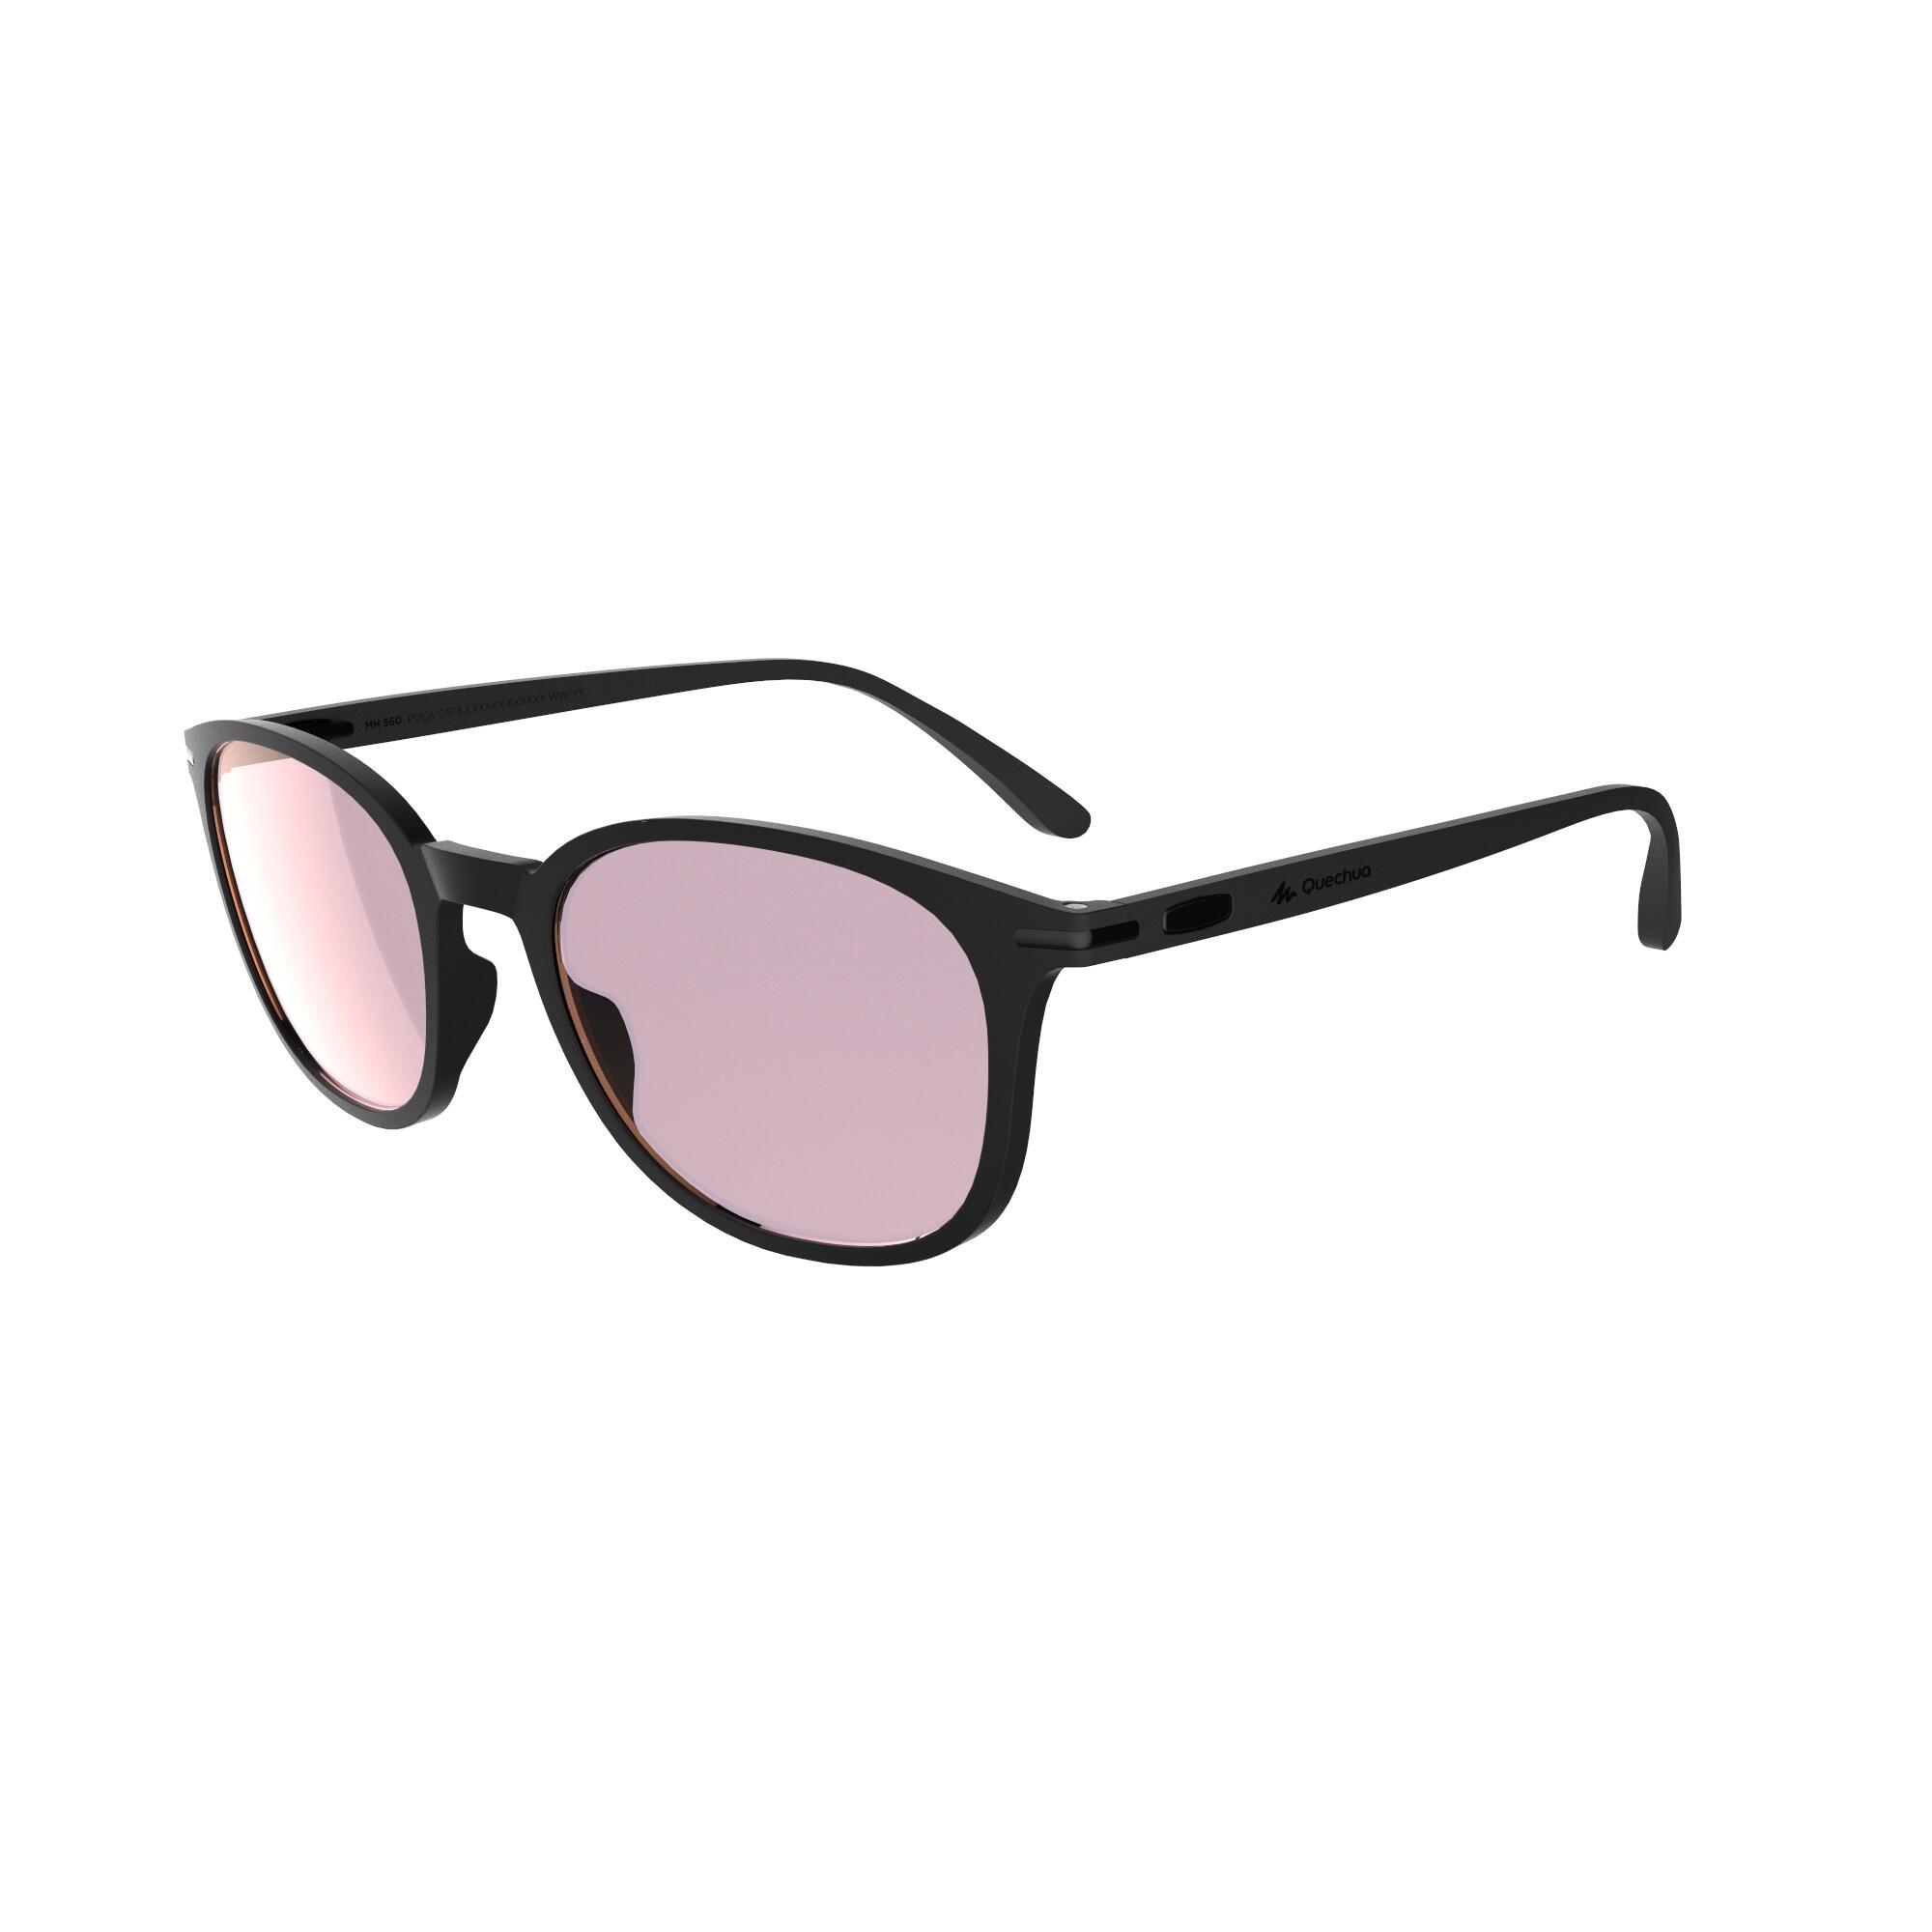 Ochelari soare drumeție MH160